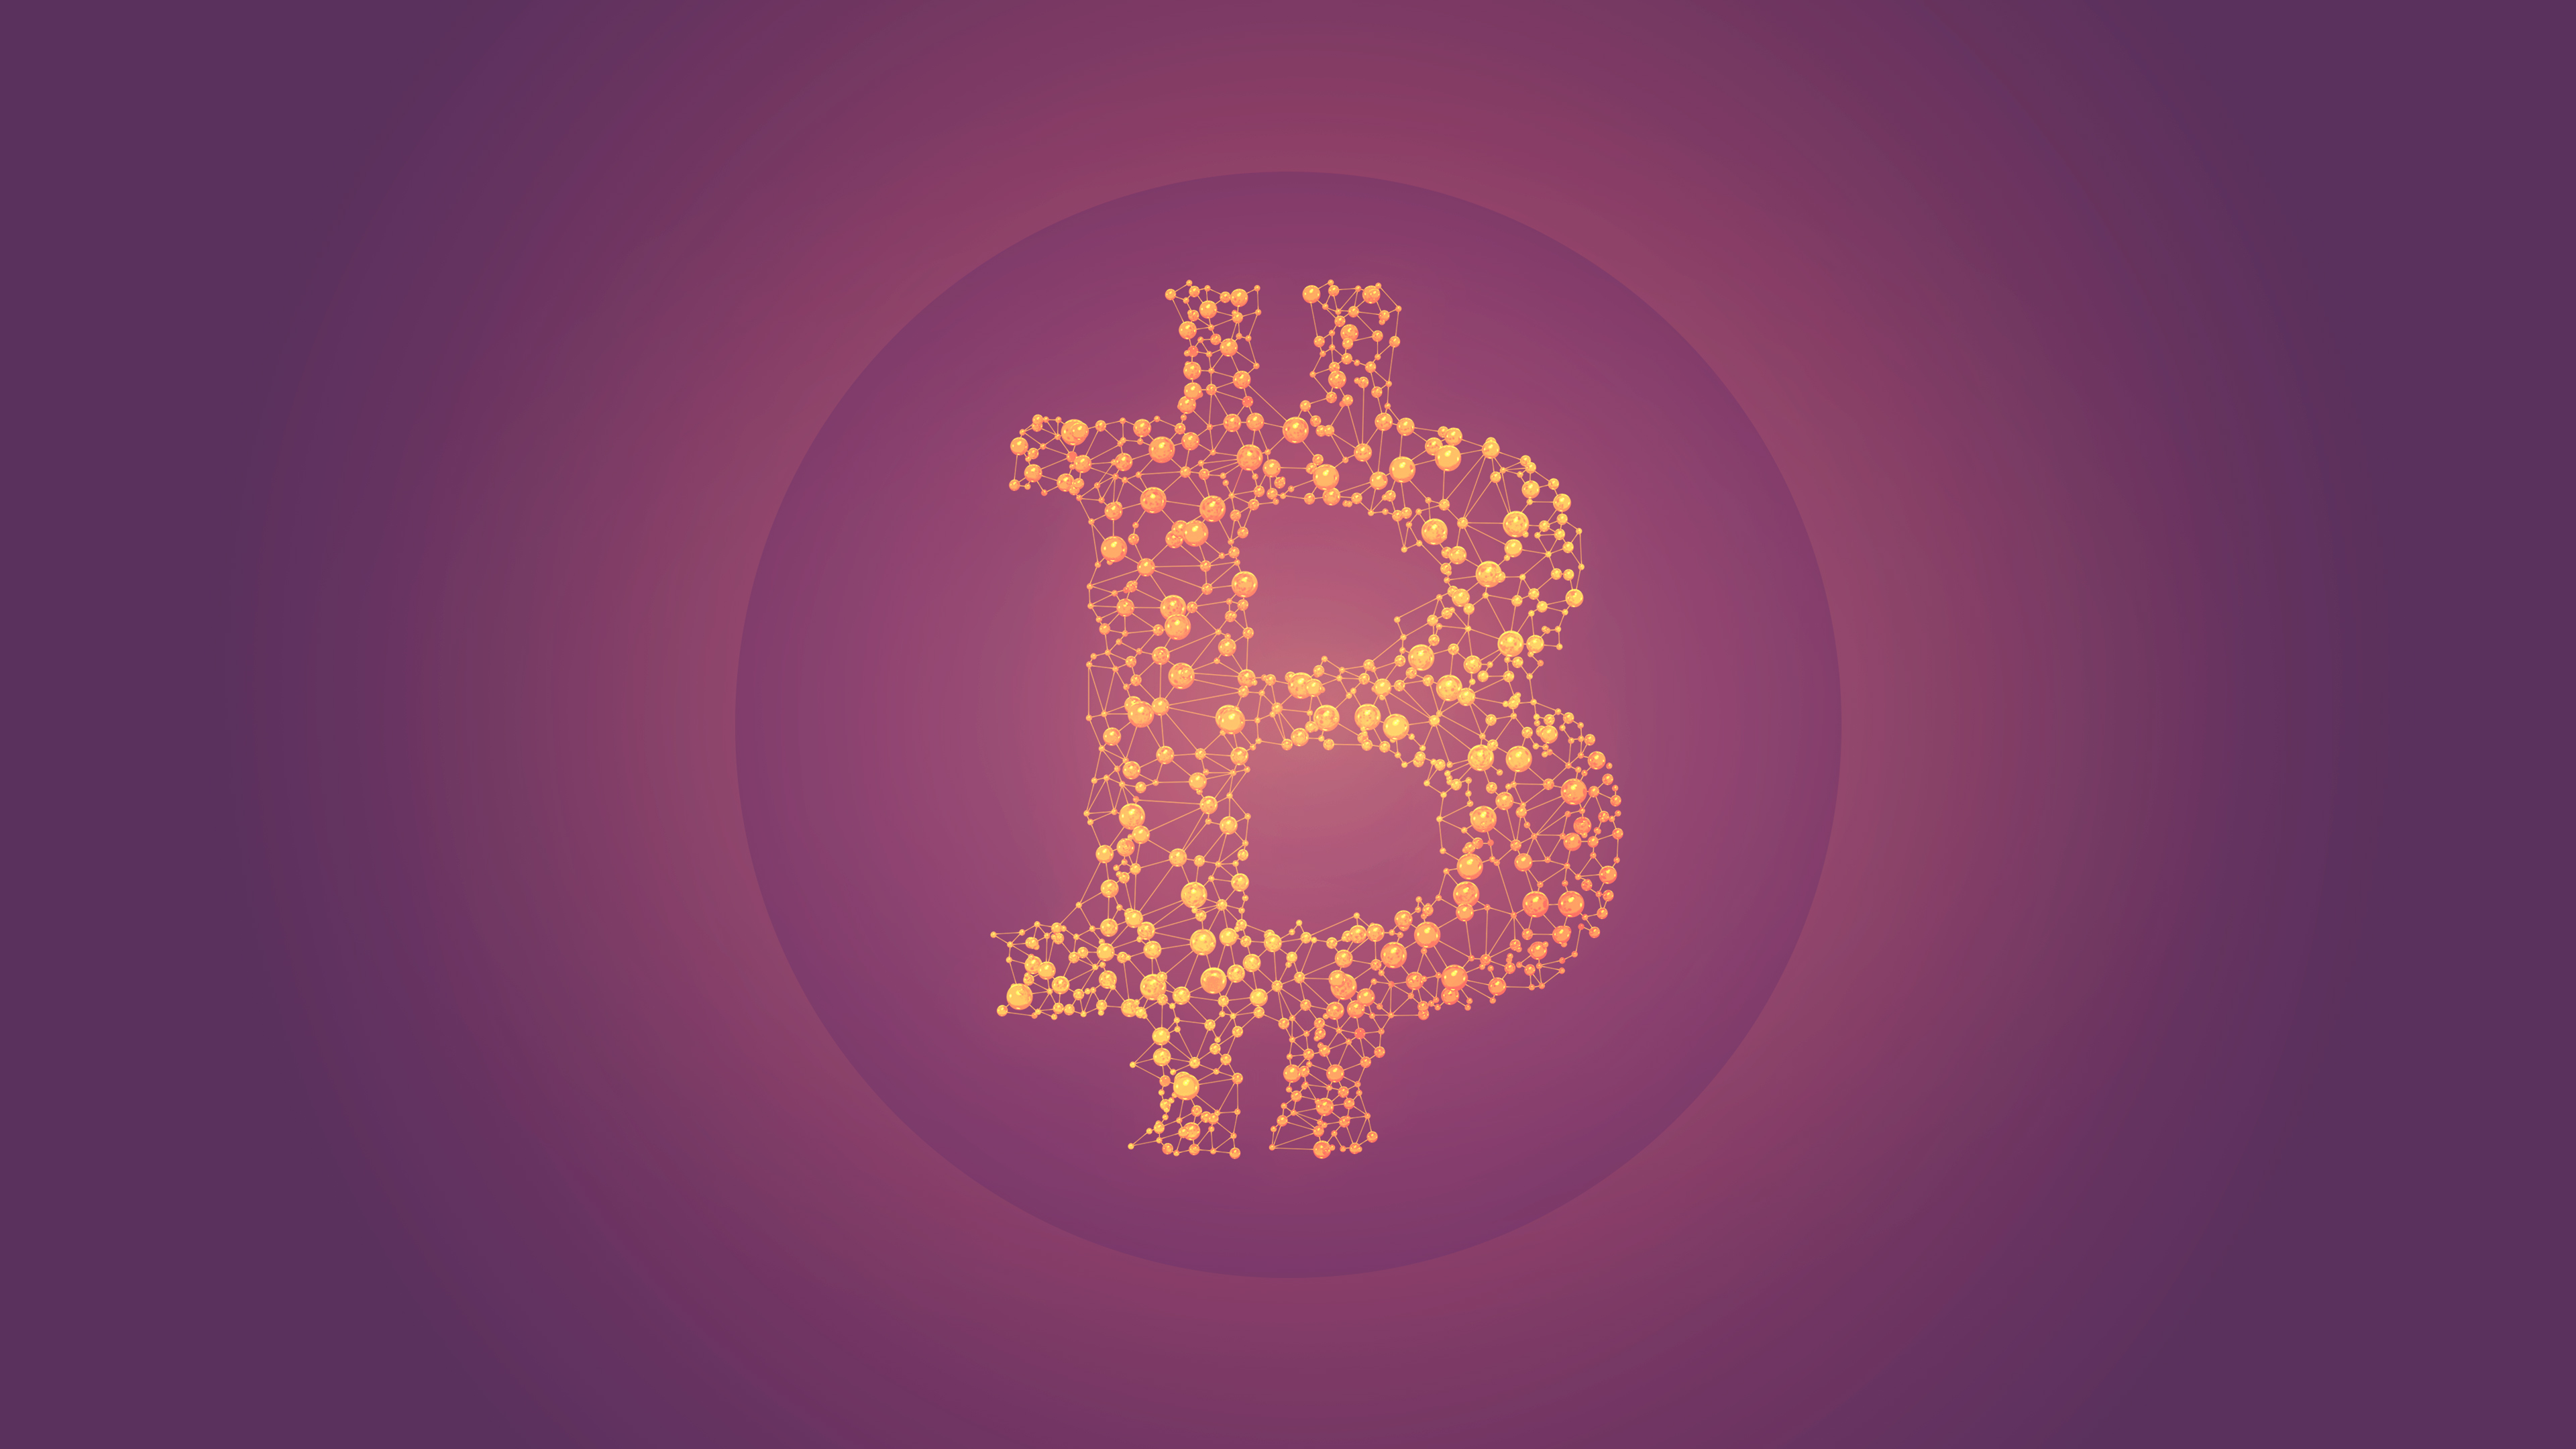 Wallpapers – Bitcoin Art Gallery